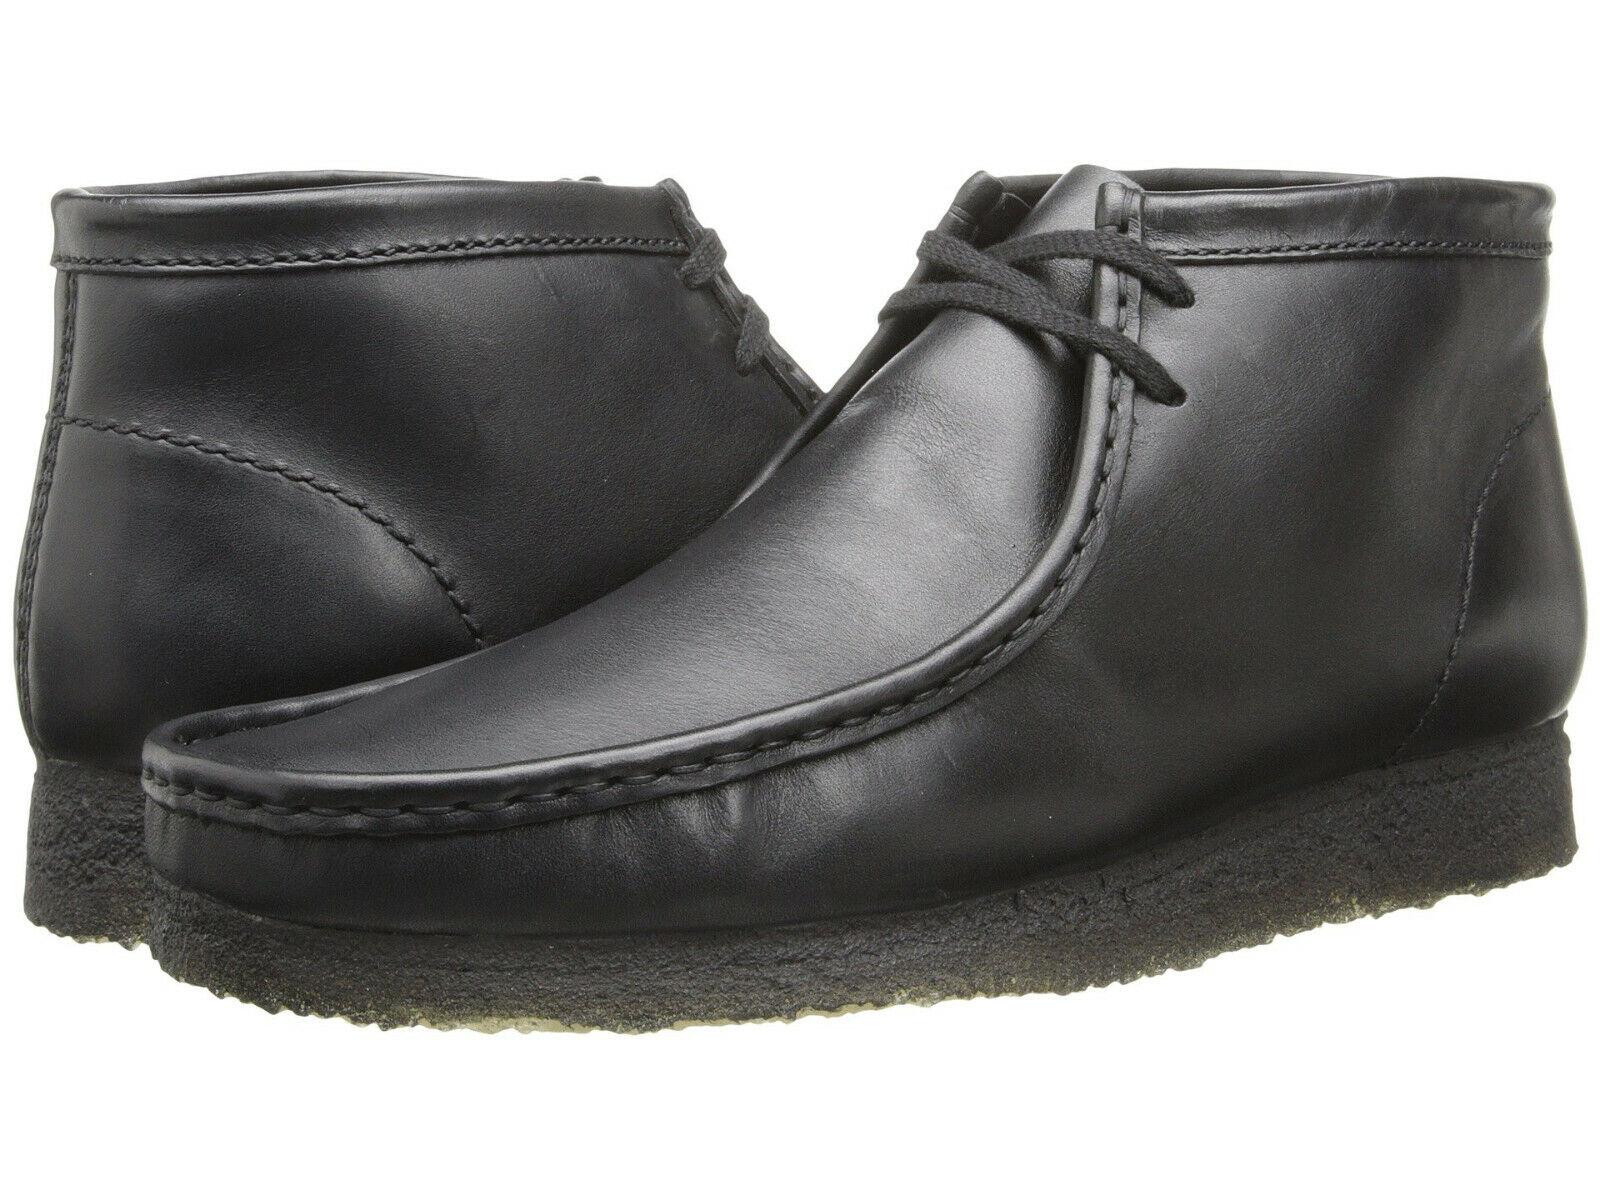 Men's Clarks Originals 'Wallabee' Boot, Size 10 M - Black